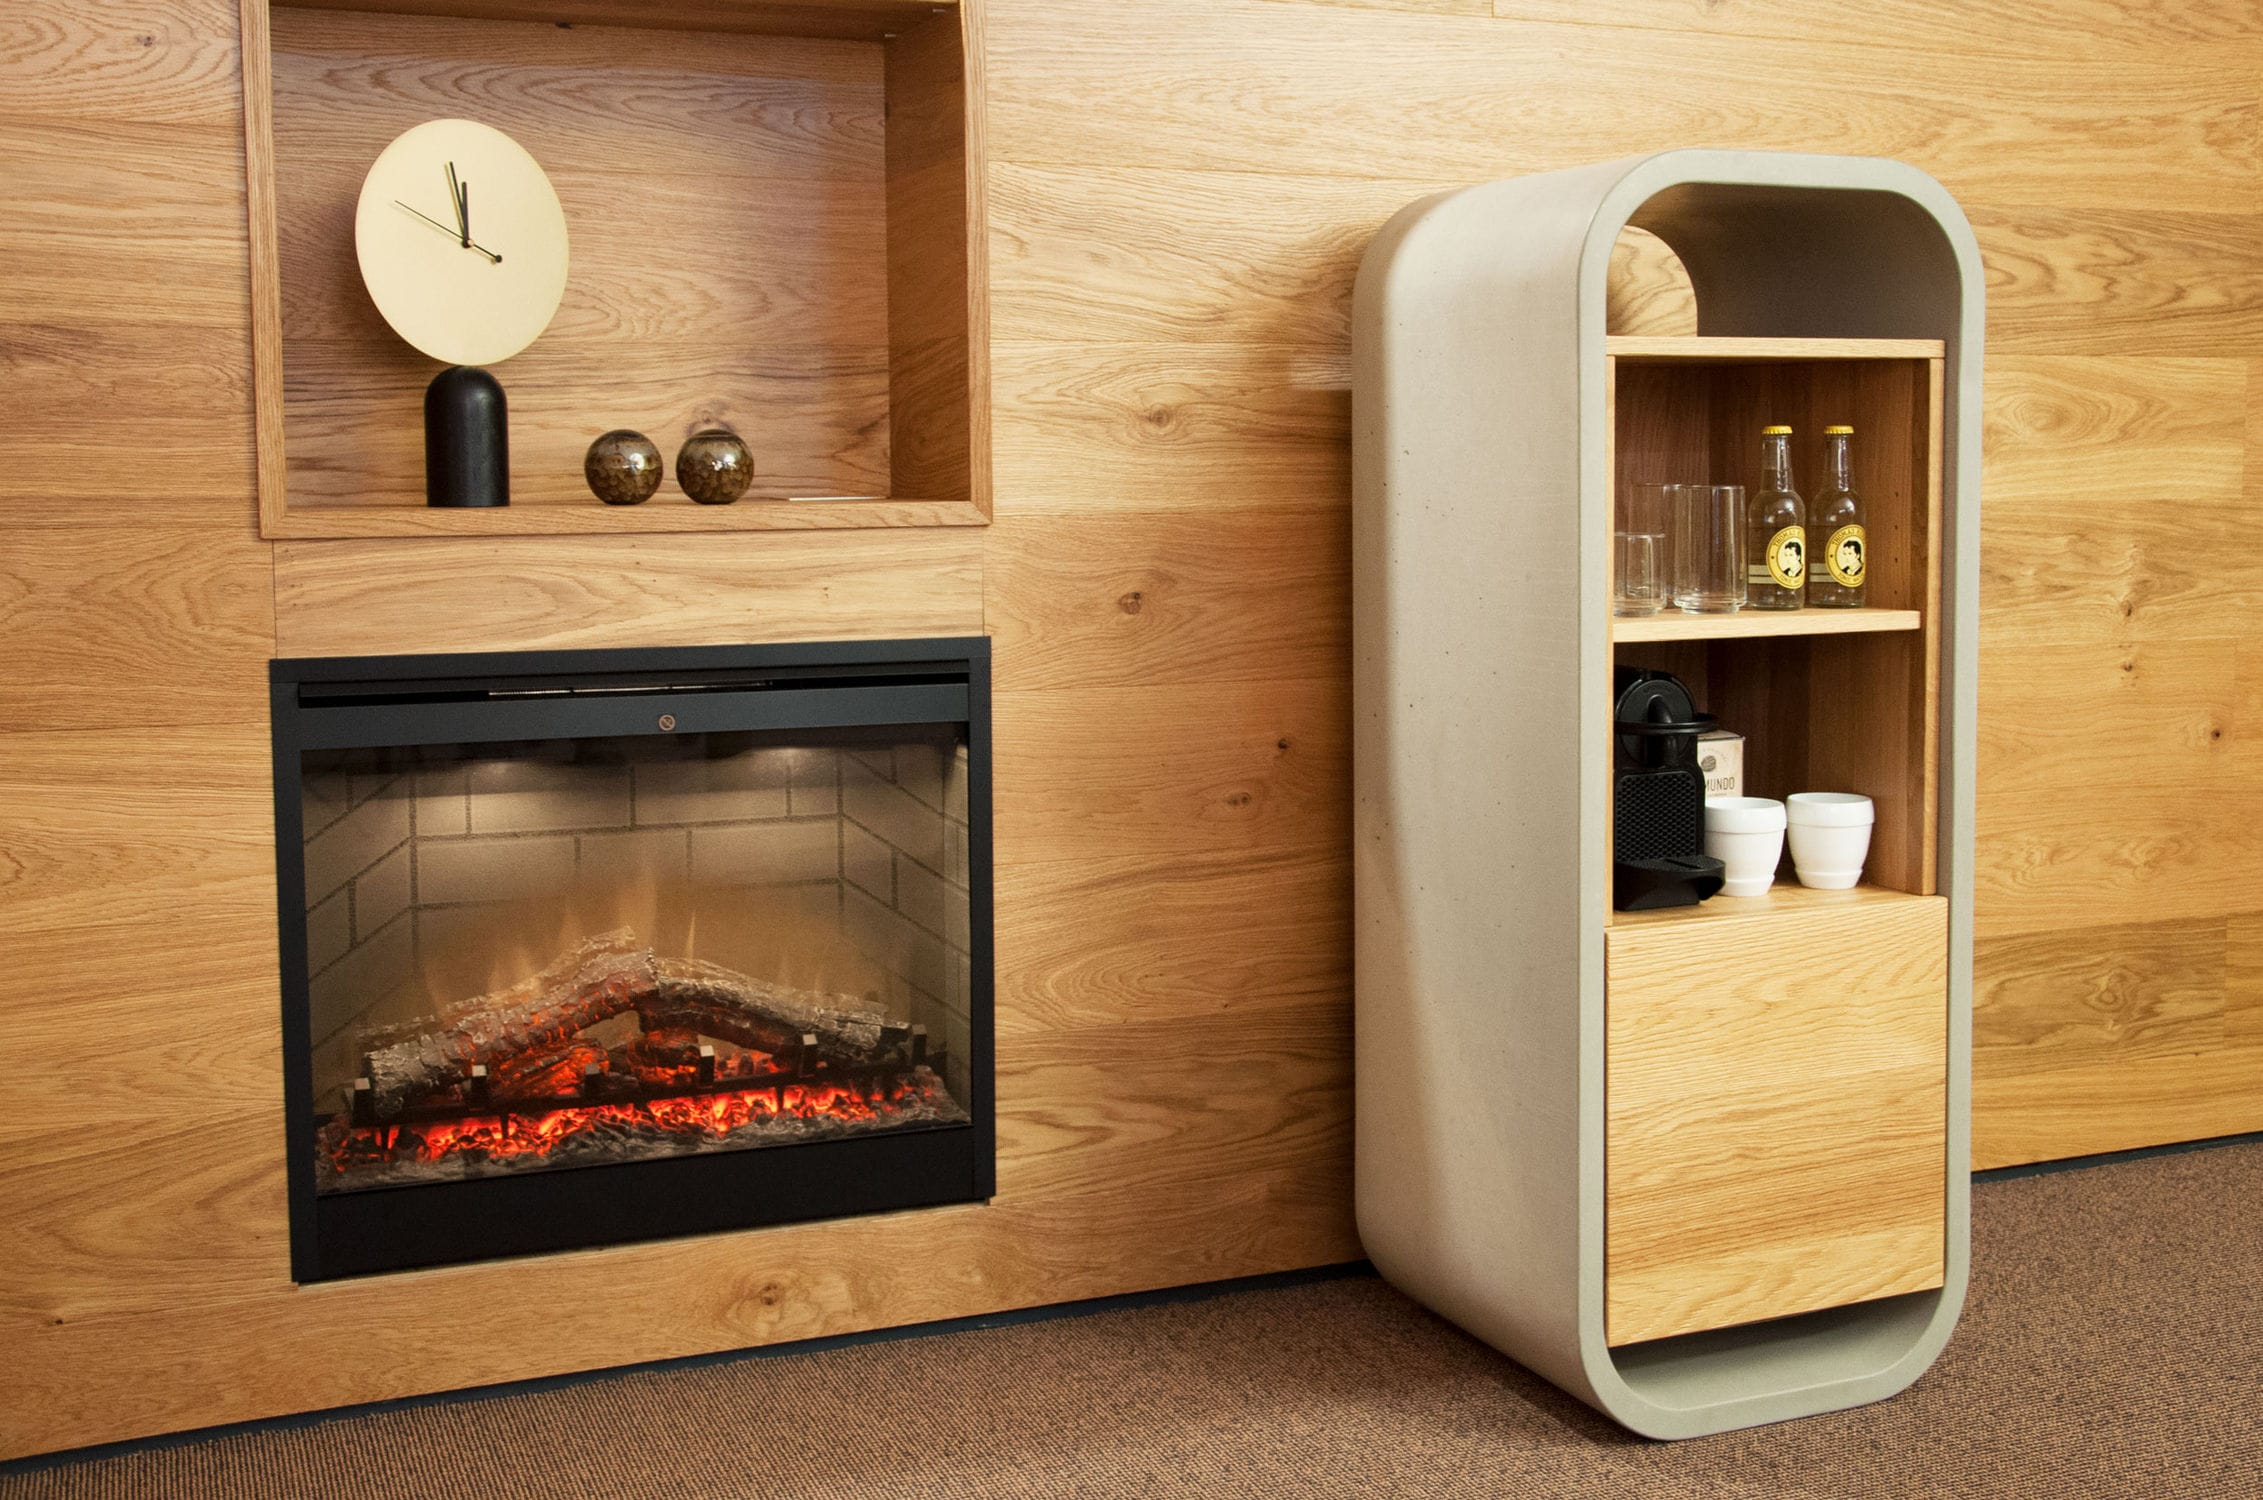 Meuble minibar contemporain en béton en chêne pour chambre d